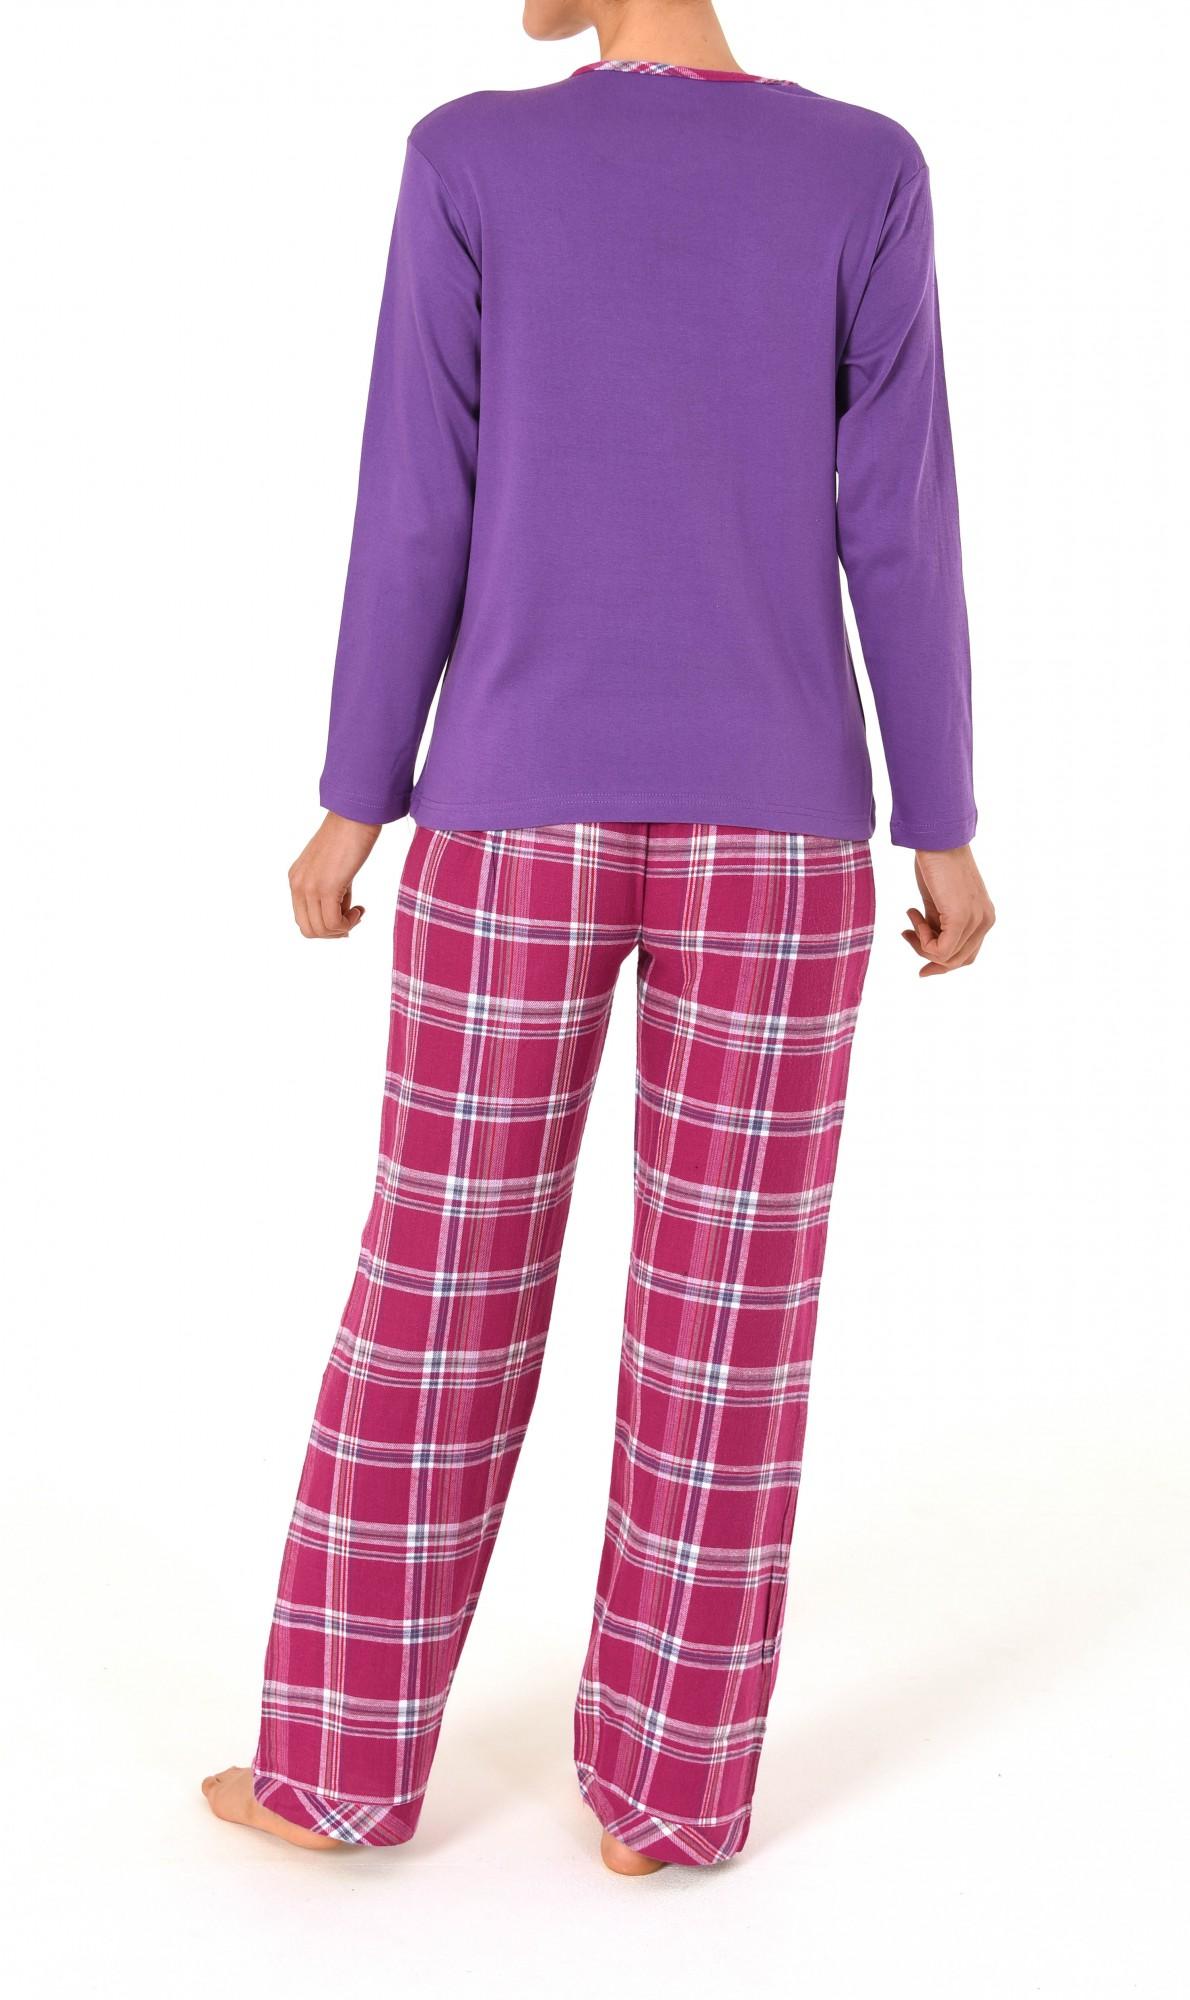 Damen Flanell Pyjama Mix & Match – Hose Flanell Oberteil Interlock  – Bild 4